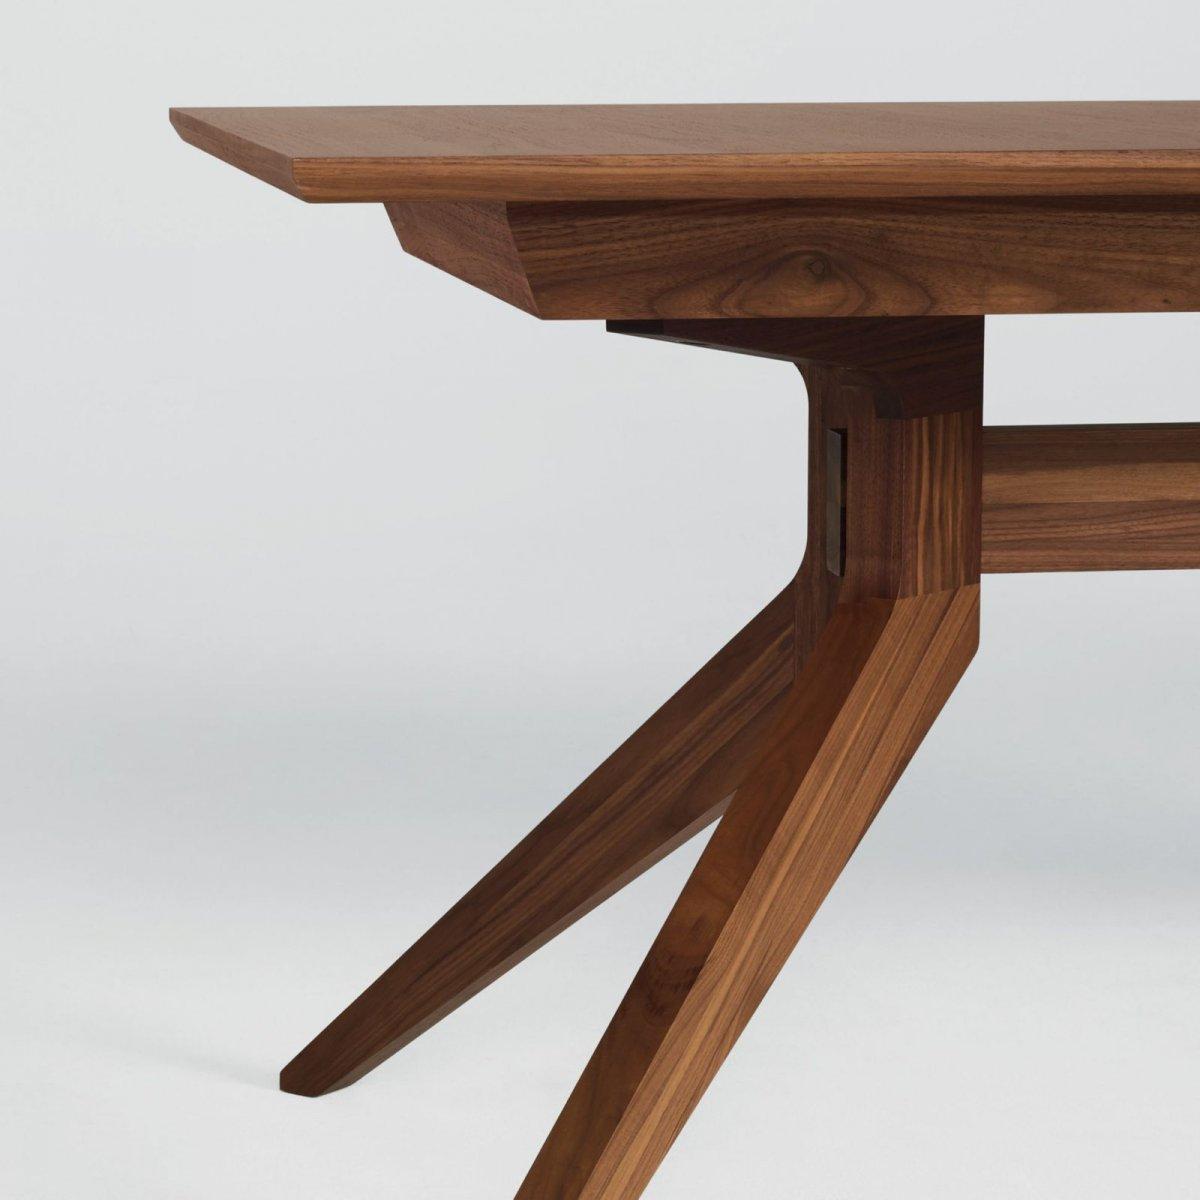 Cross Extending Table, walnut, detail.